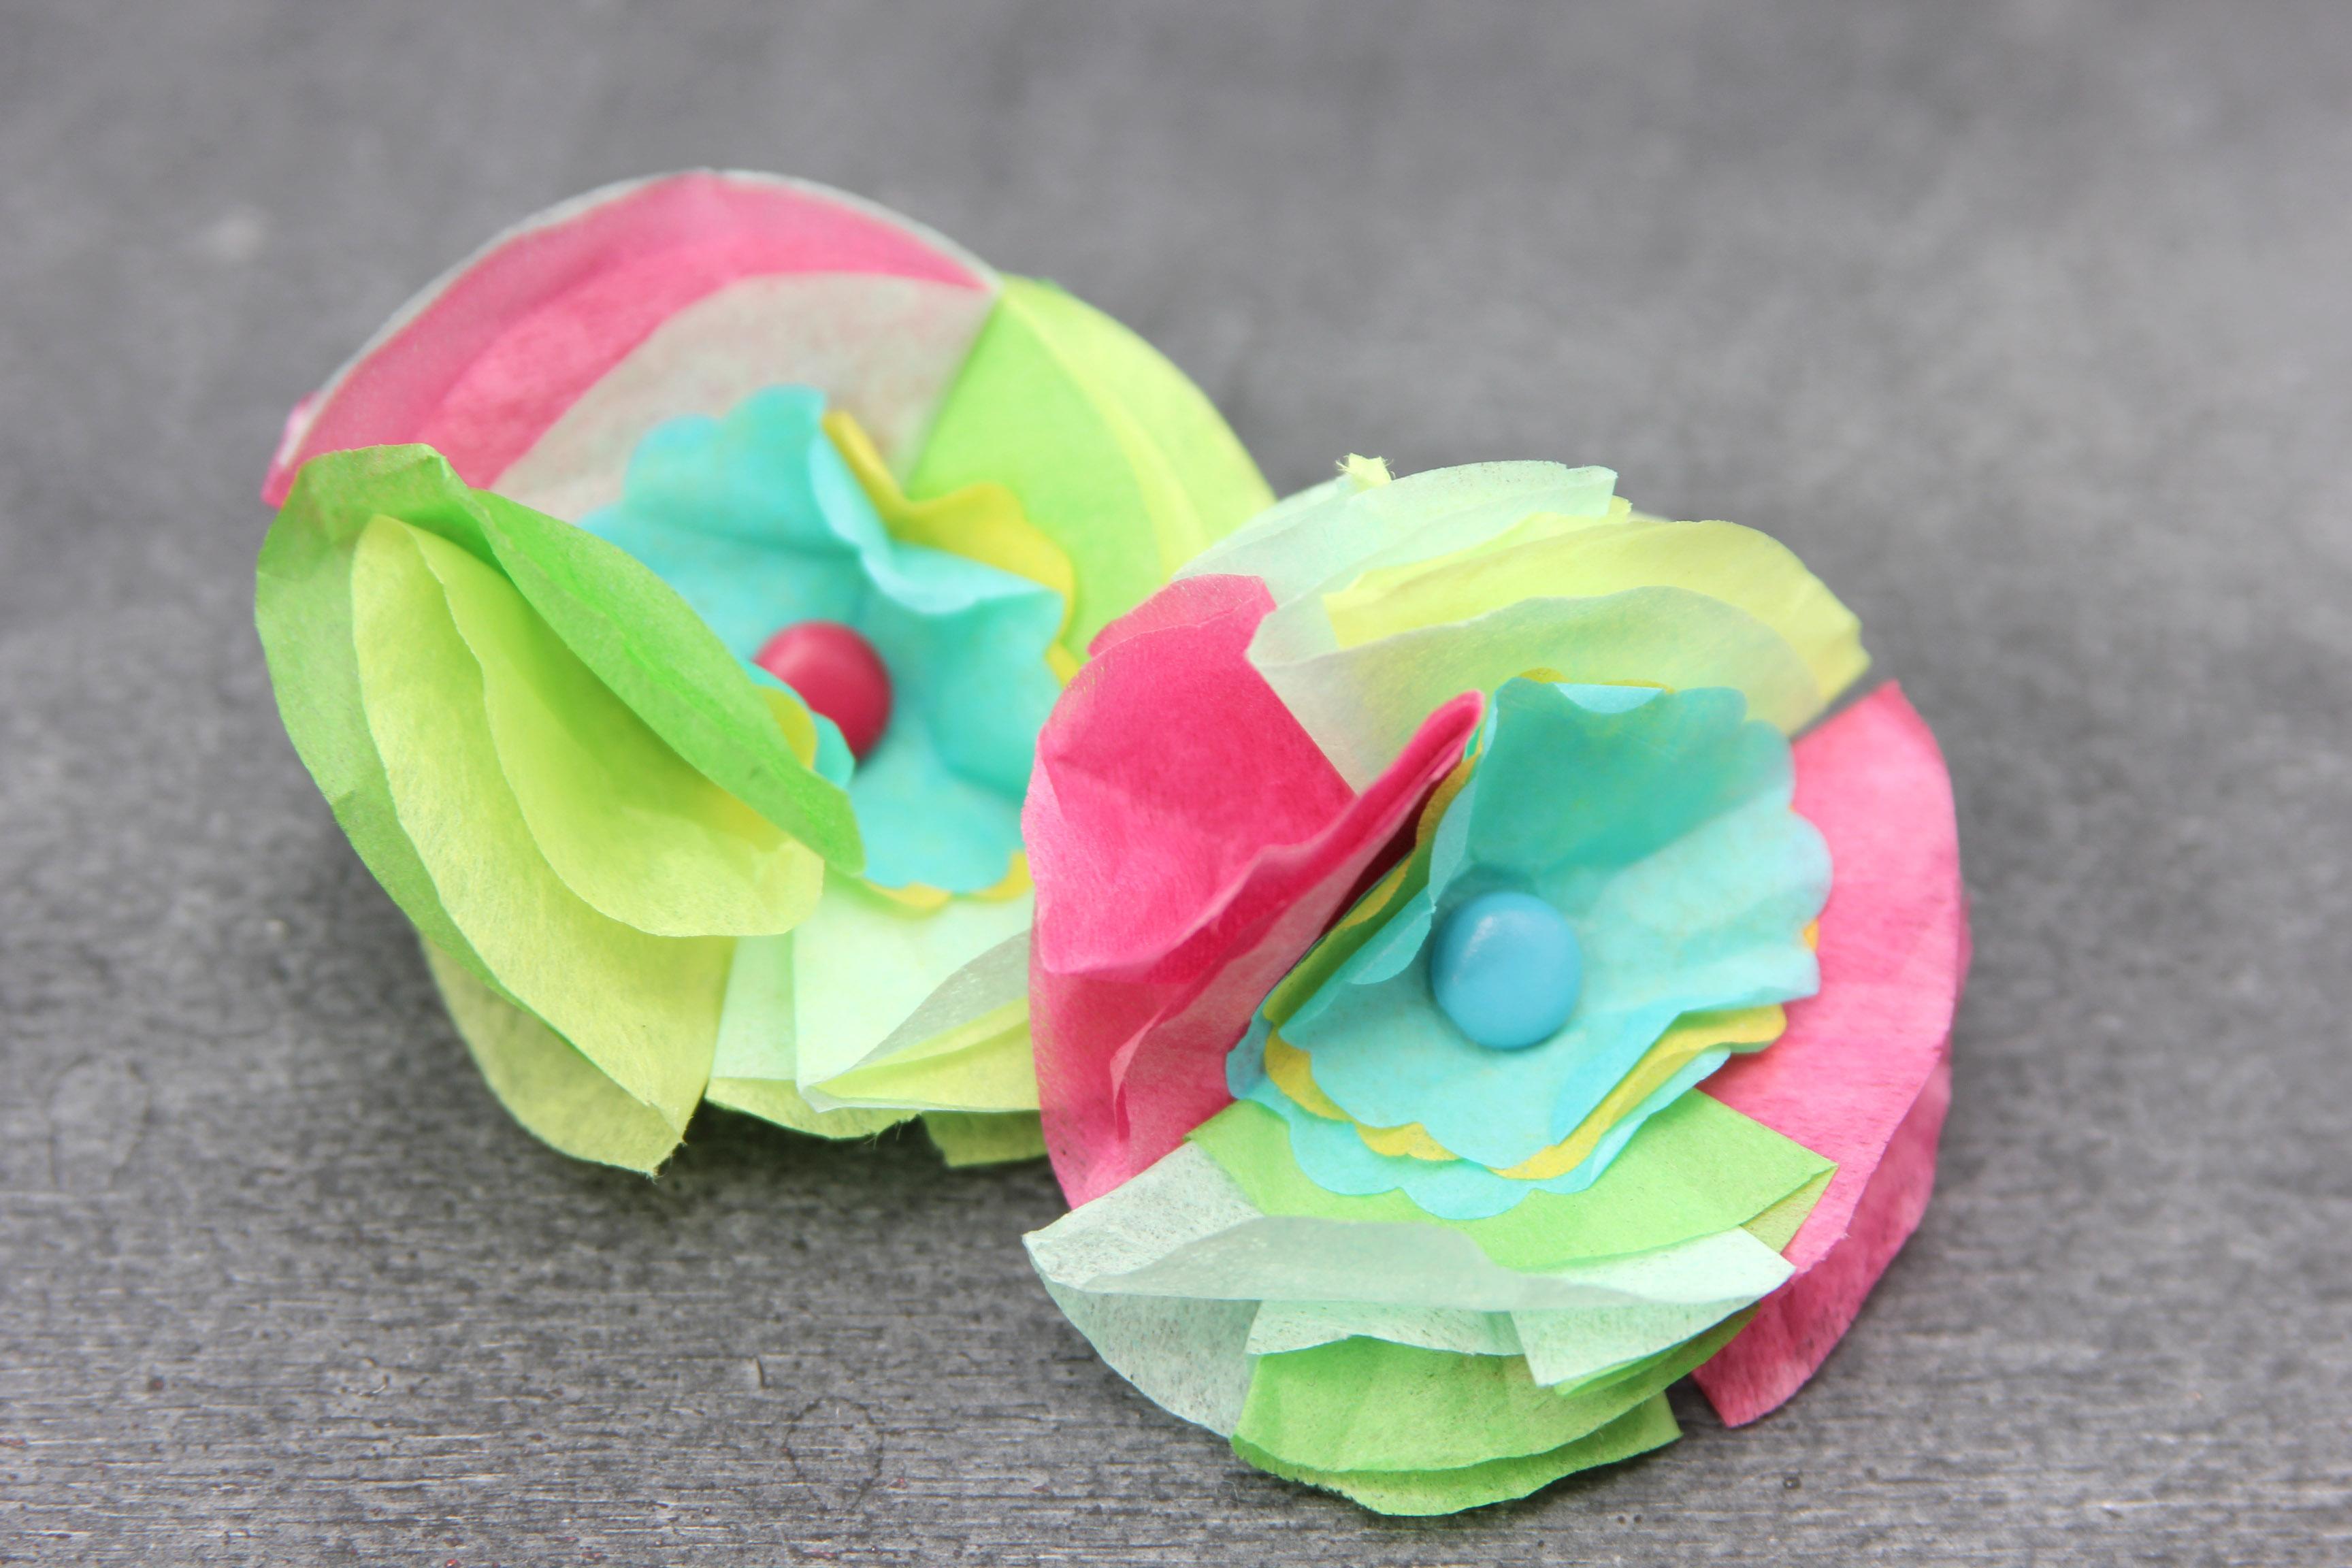 7 Mothers Day Gifts For Grandma Kiwico